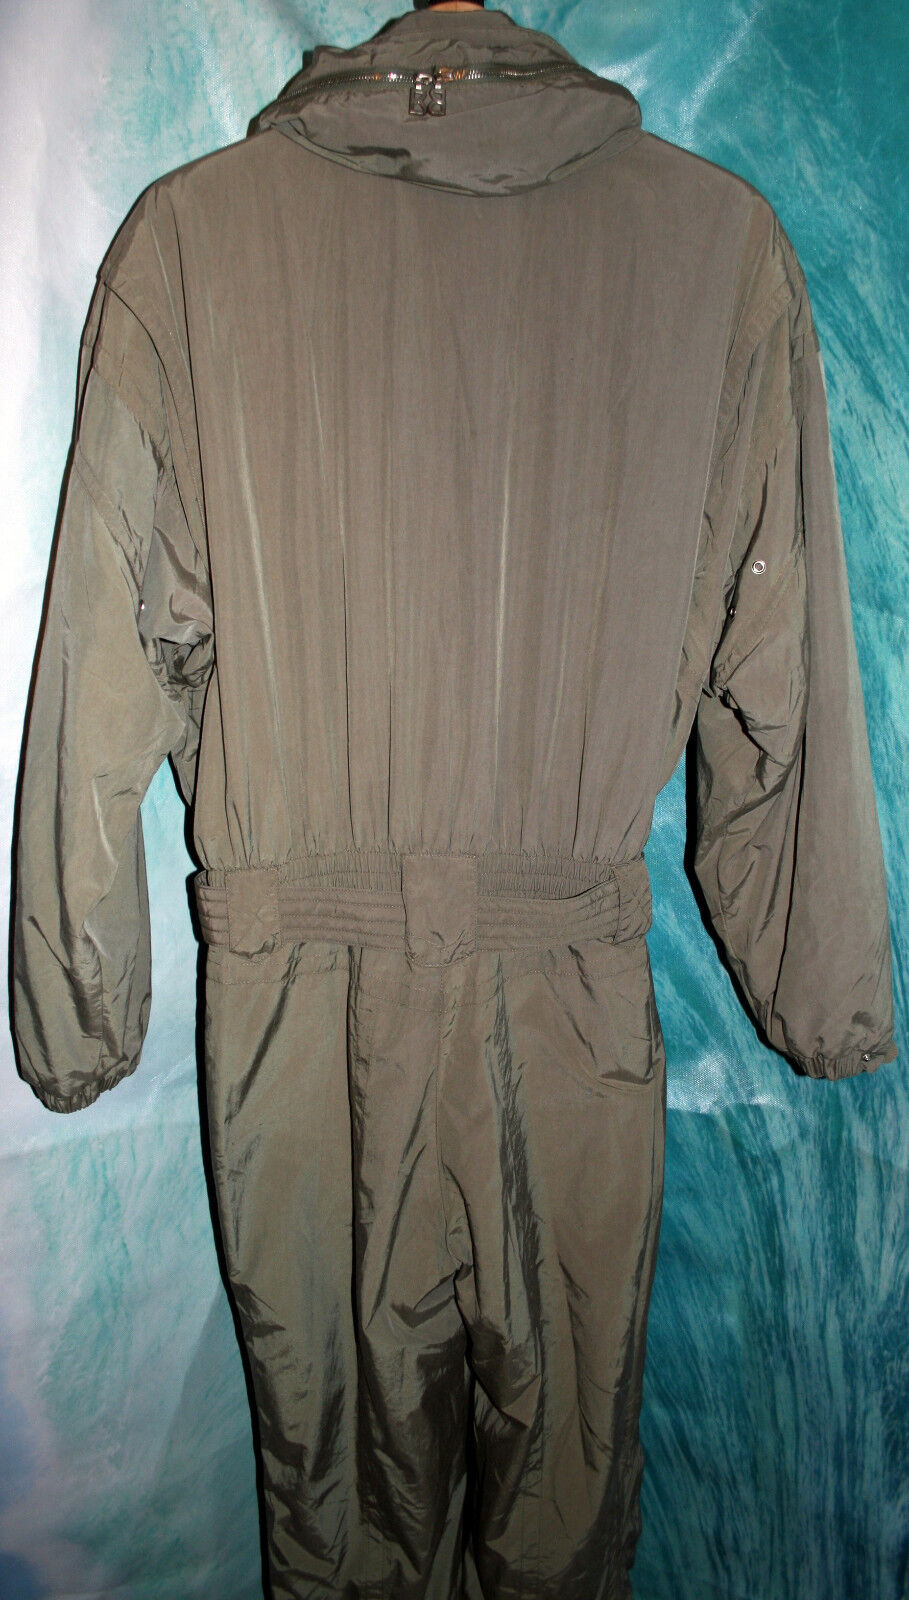 Купить Bogner RN 54198 - Mens Premium Bogner Ski Suit, Overalls Xlnt Condition, Size 40